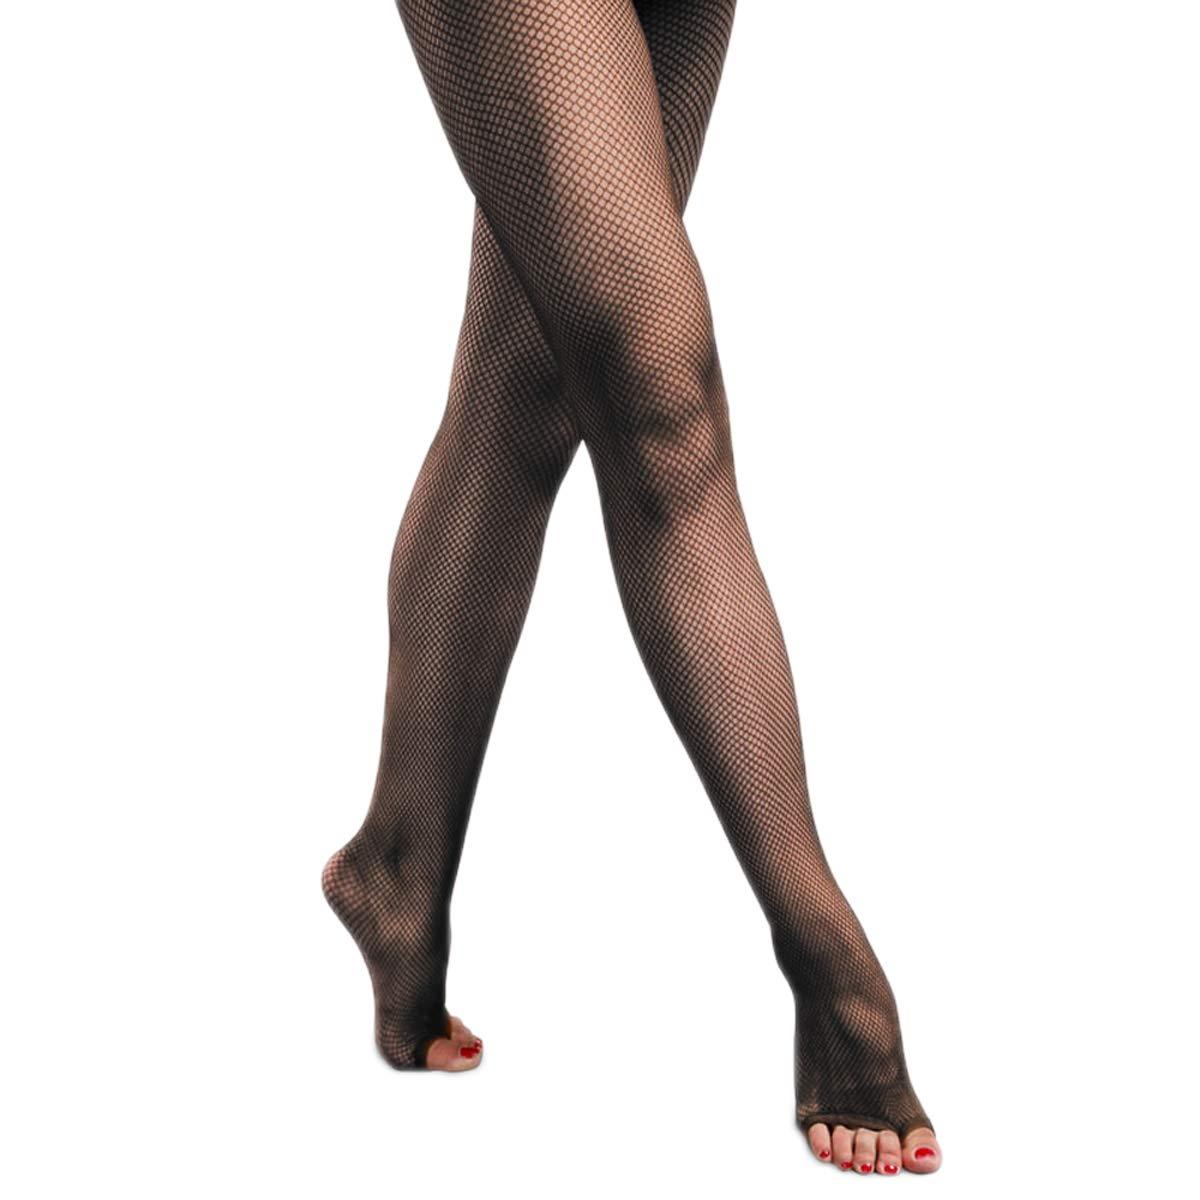 e02120b3be8e0 Amazon.com: Pitping Latin Dance Pantyhose Stockings Socks Open Toe Fishnet  Toeless Tights ,Beige,One Size: Clothing